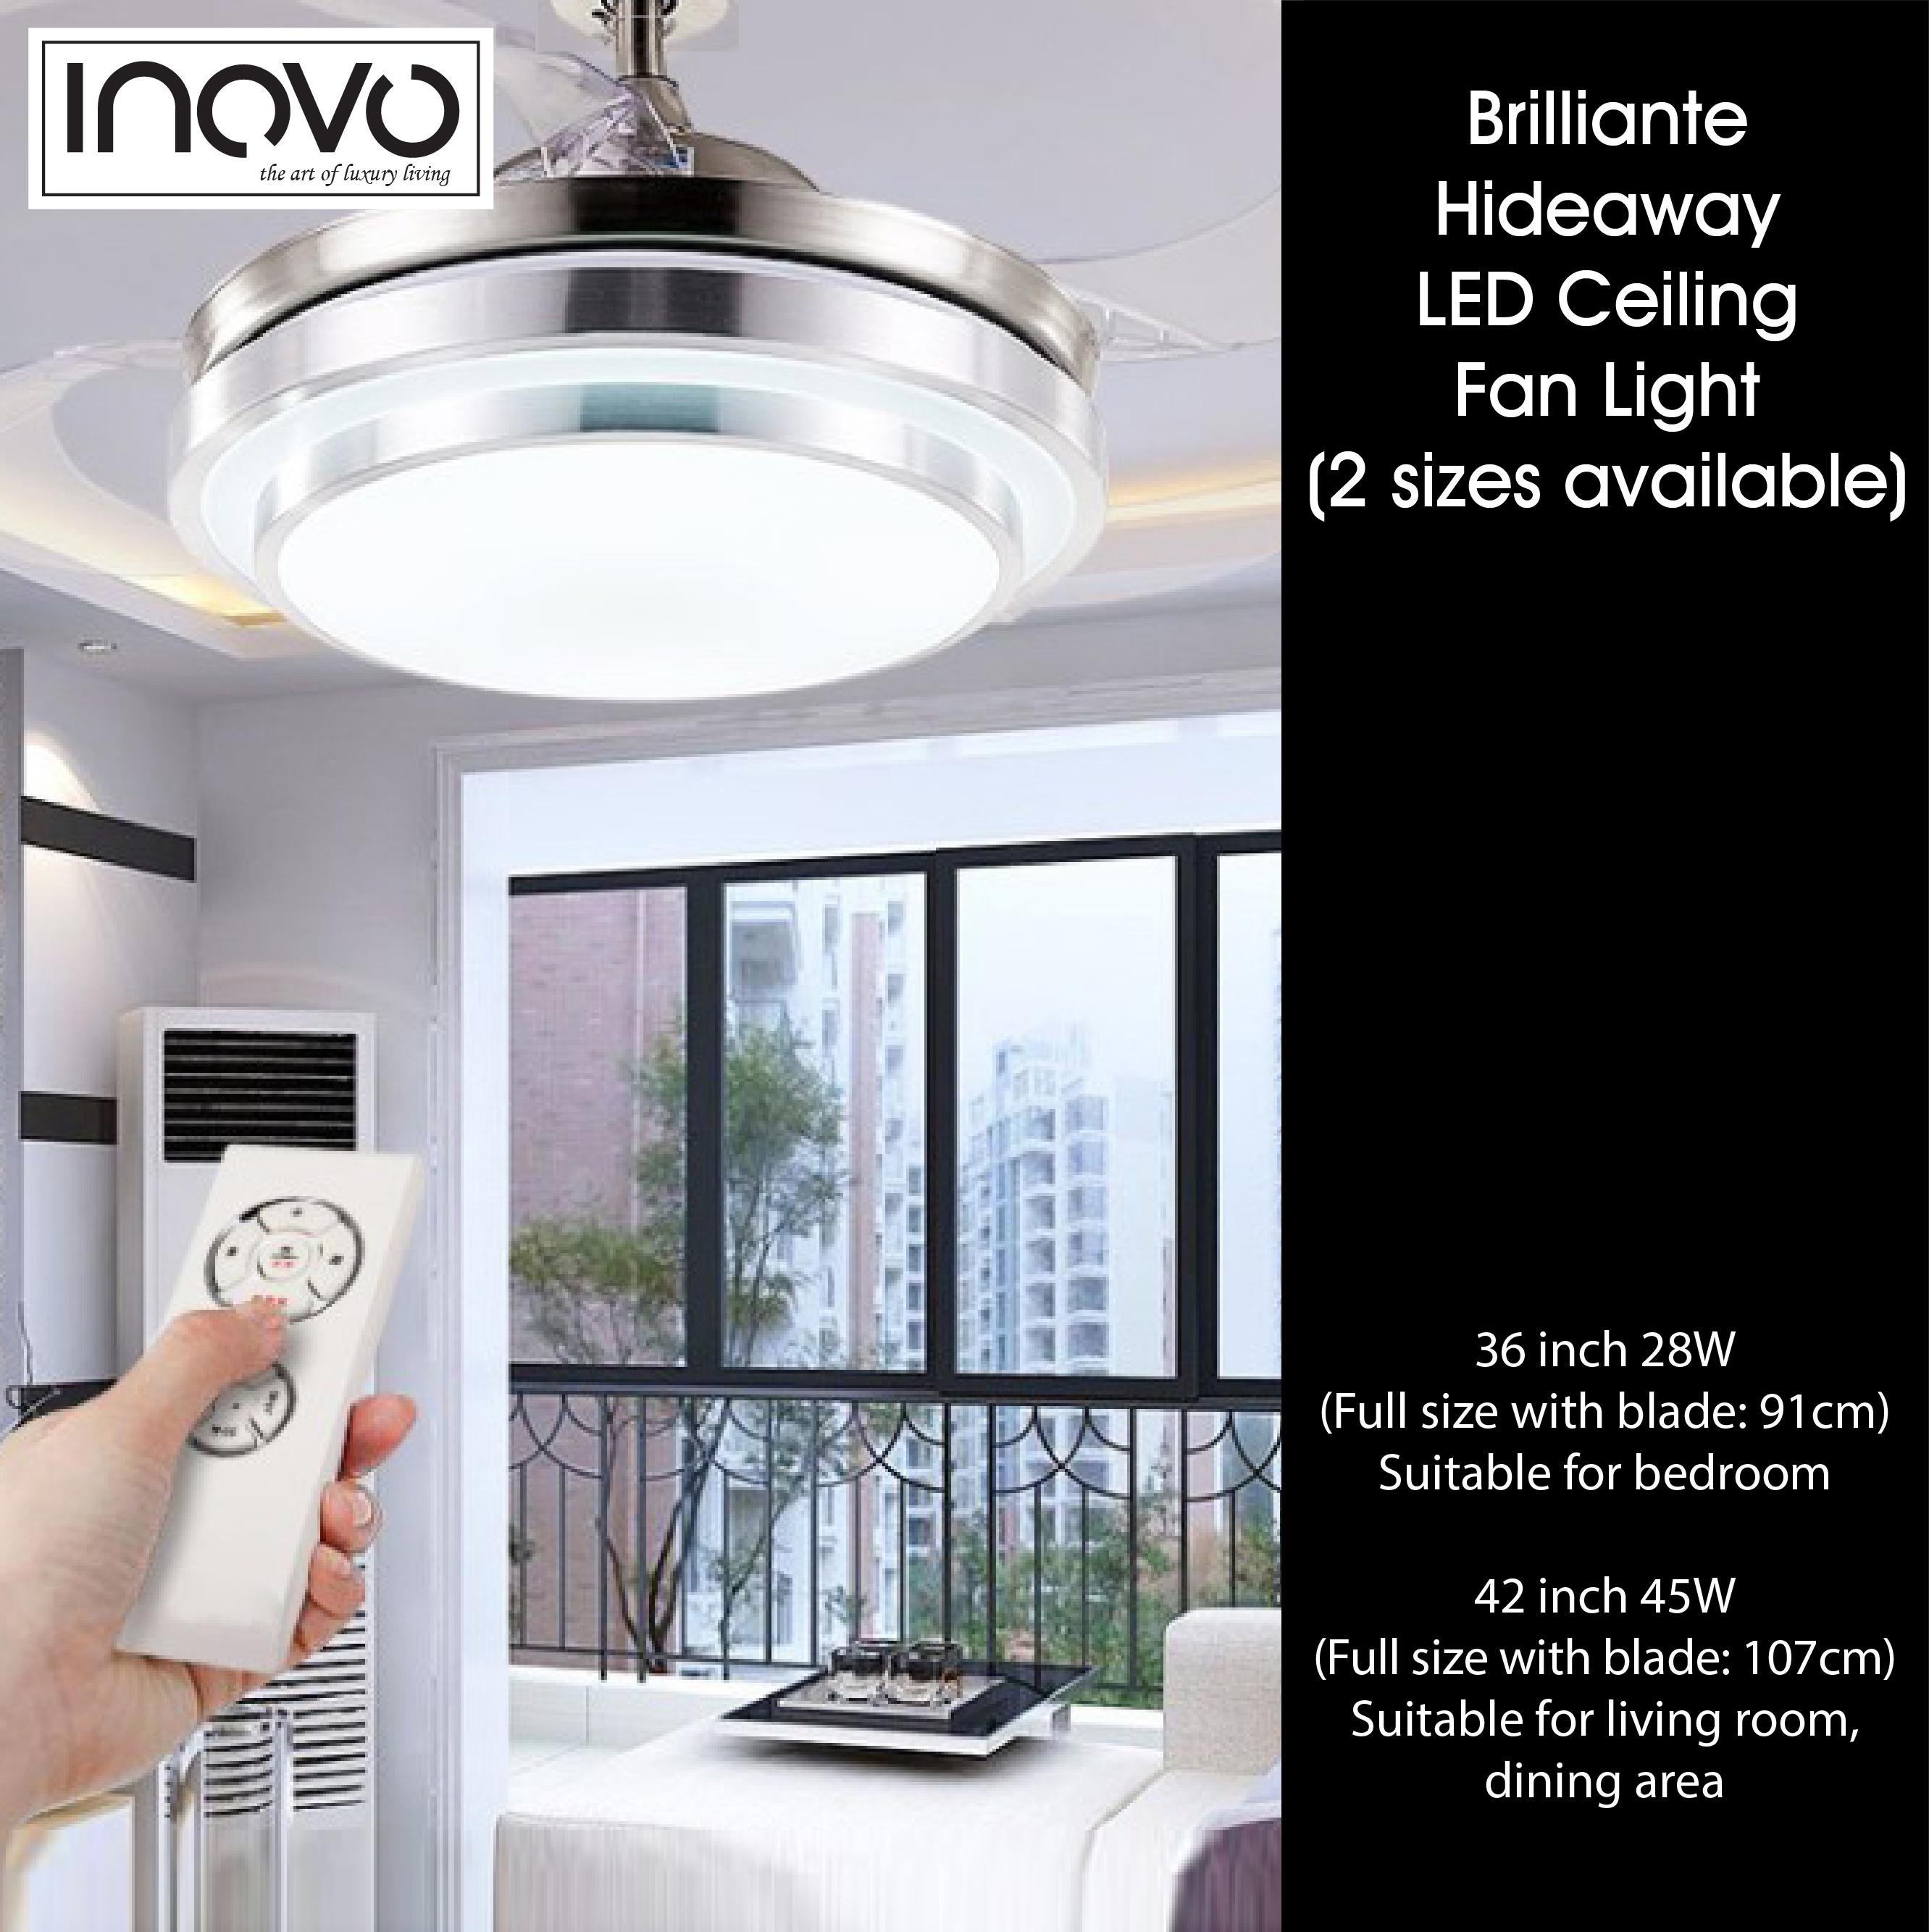 INOVO Brilliante Hideaway Ceiling Fan with LED Light – inovo